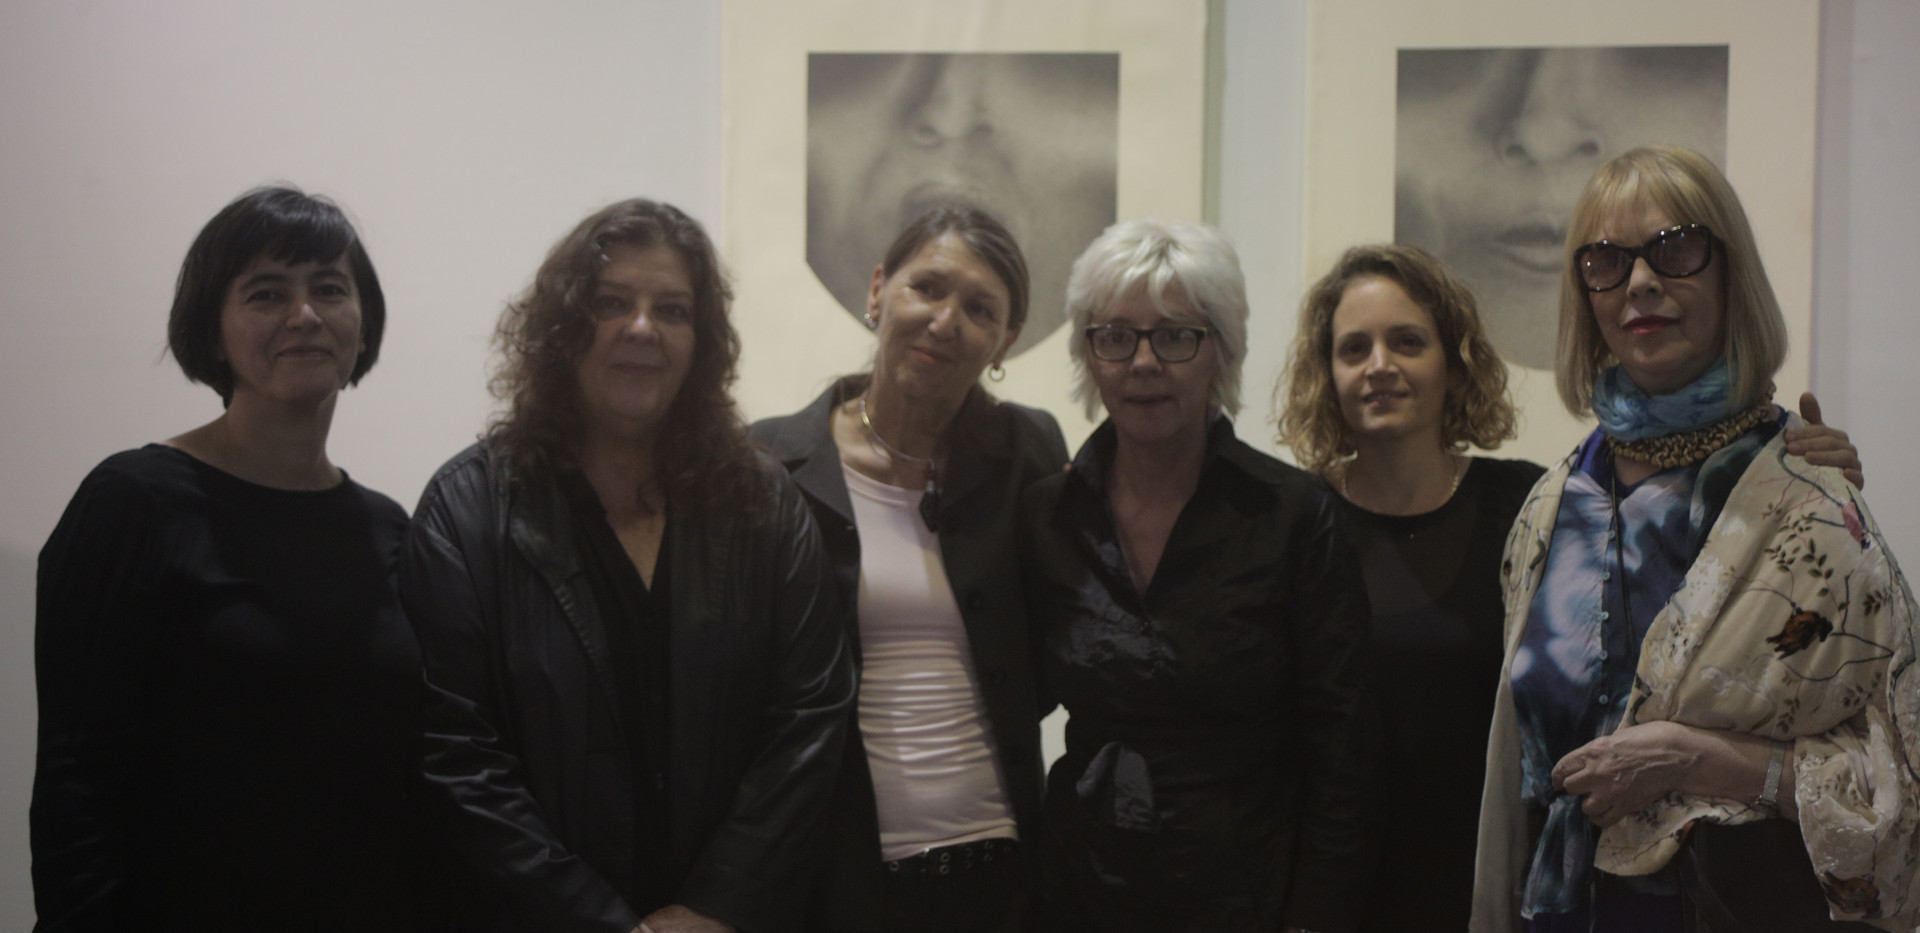 De izquierda a derecha: Alita Olivari, Crsitina Schiavi, Ana López, Dolores Casares, Mariana César y Elsa Soibelman